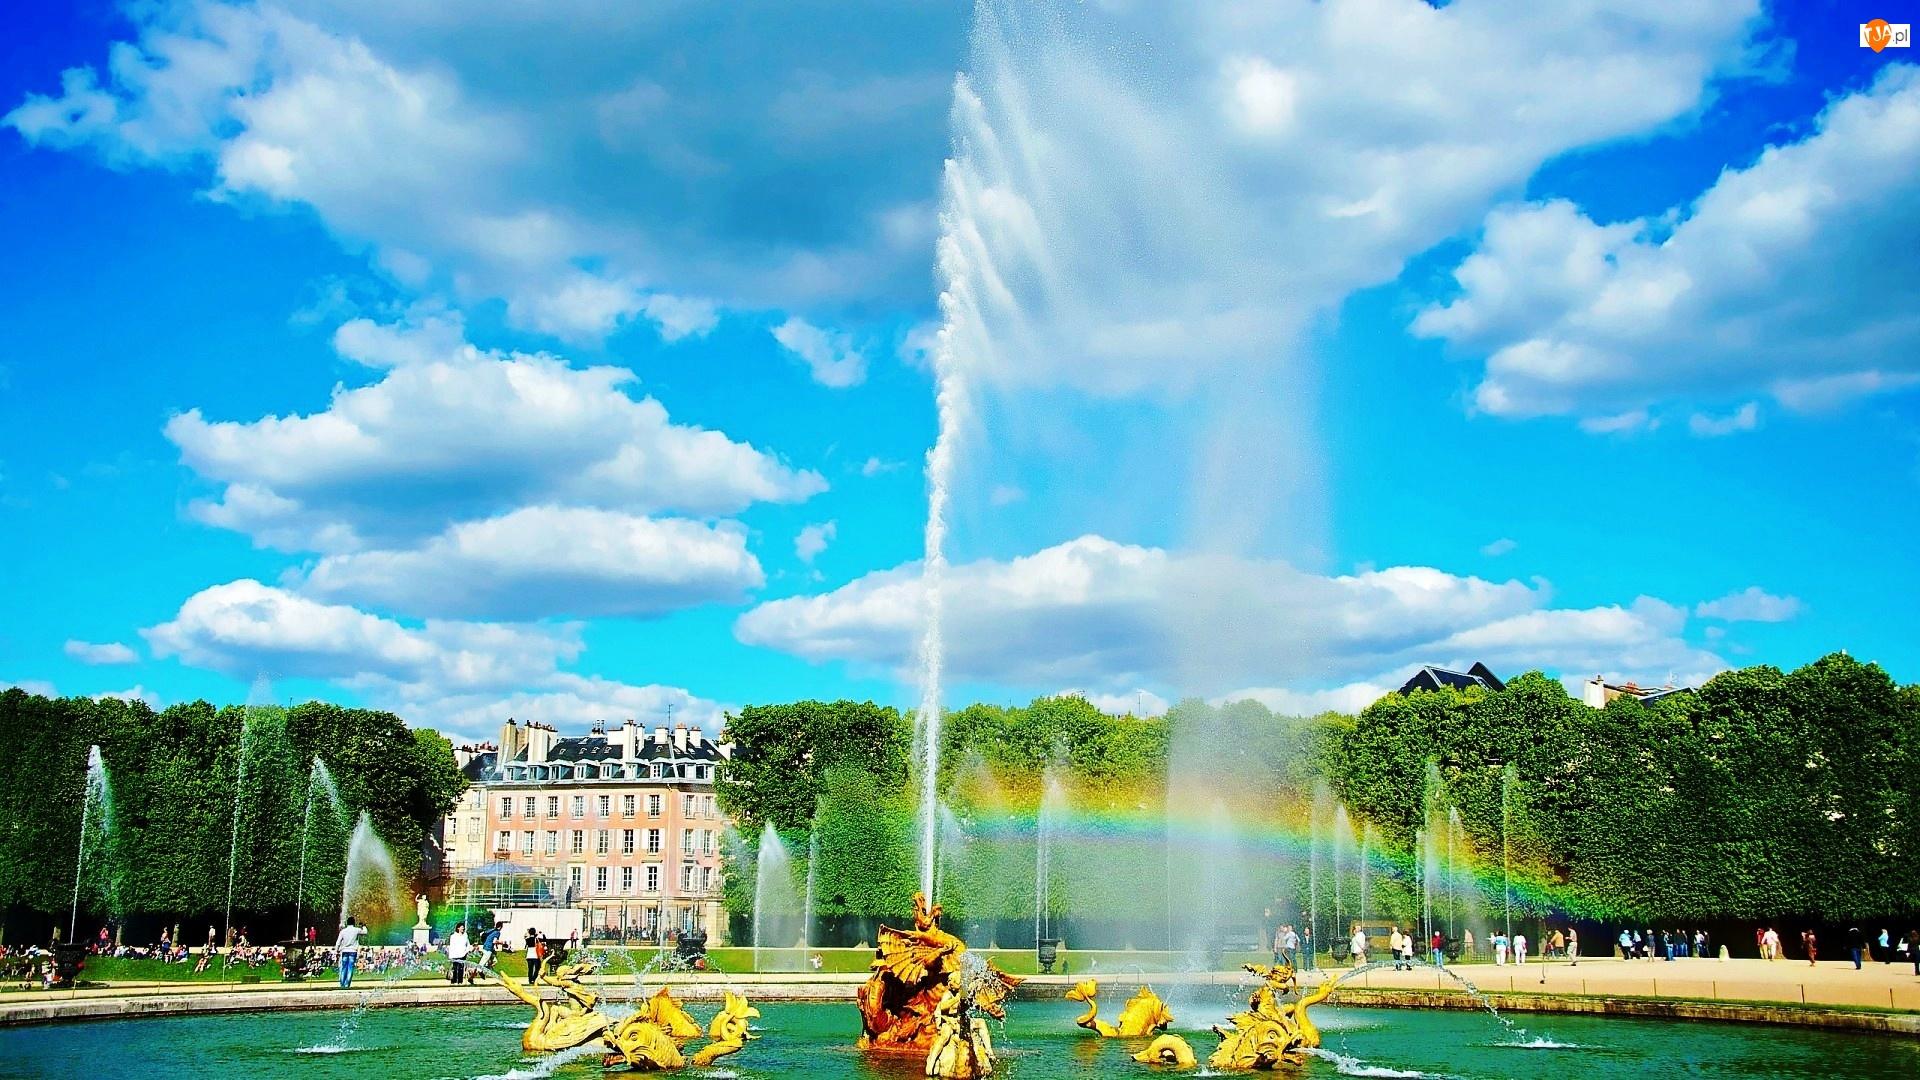 Fontanna, Ogród, Paryż, Wersal, Francja